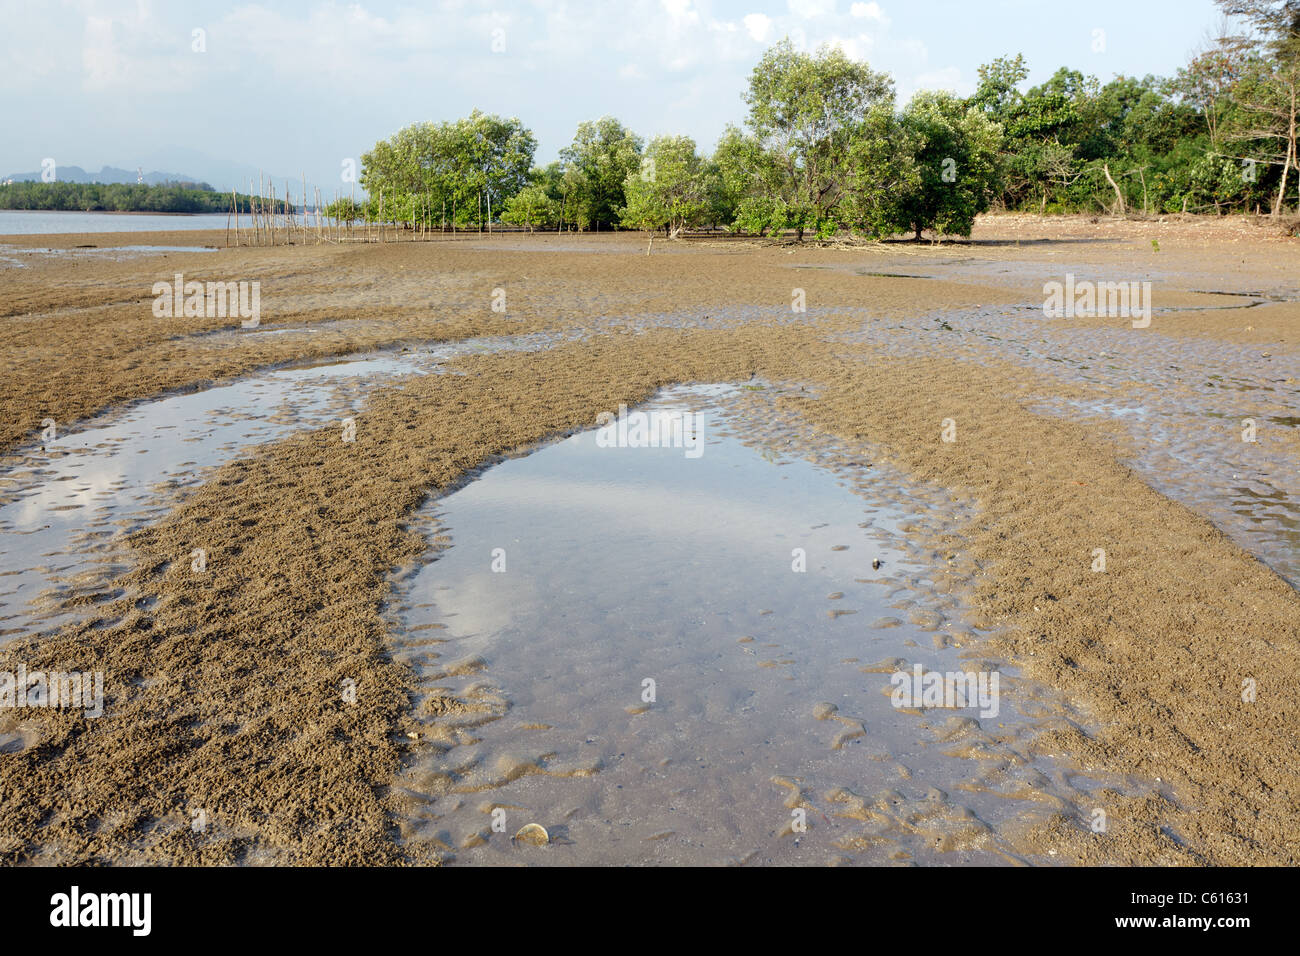 view of estuary in krabi river at low tide, krabi, thailand Stock Photo